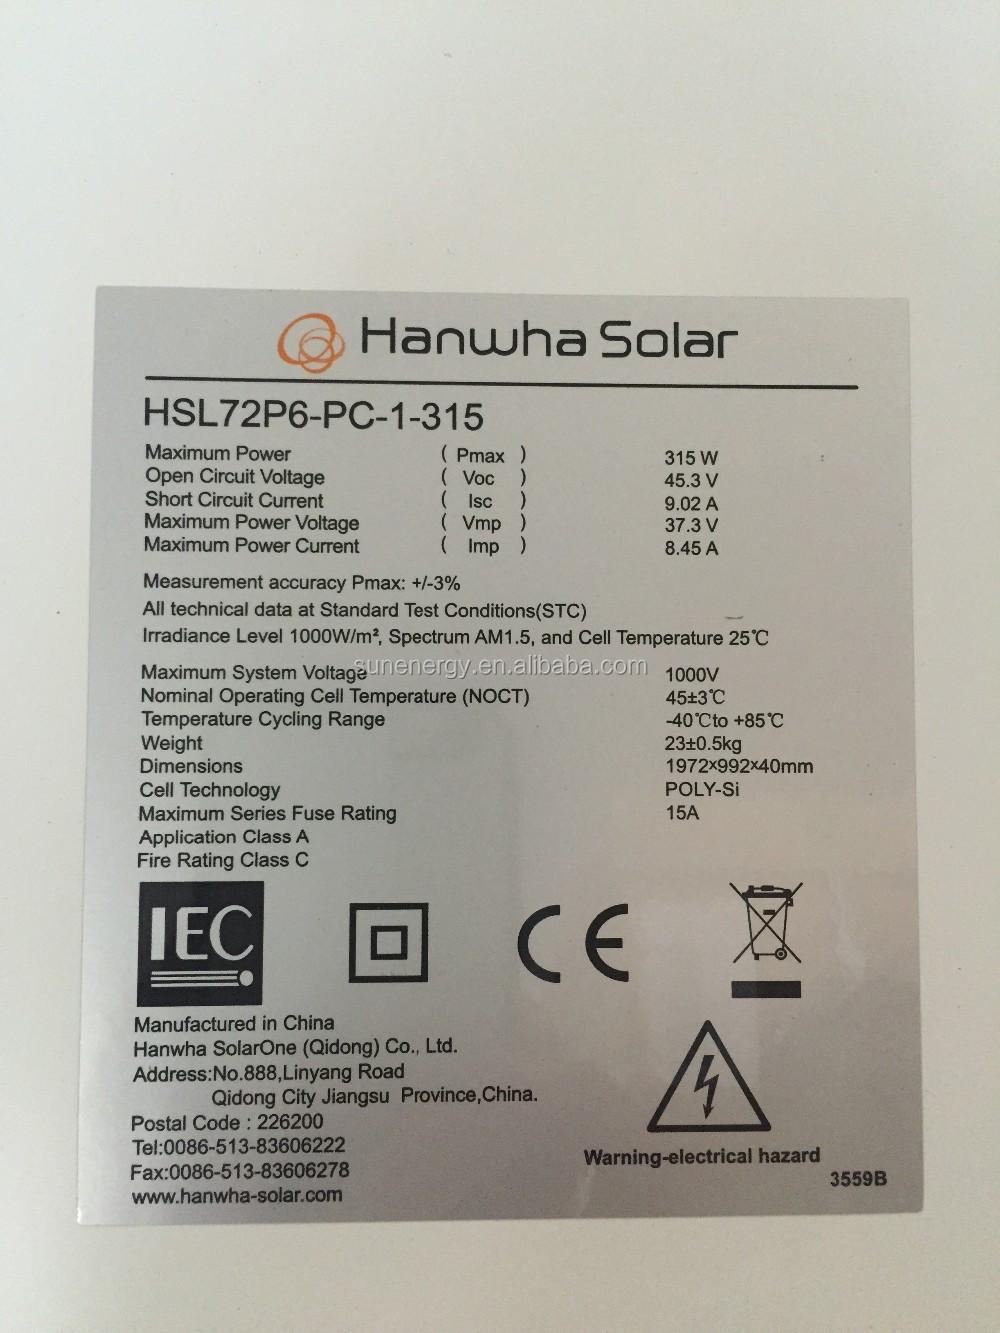 Hanwha Solar Panel In Stock 300w 310w 320w Hsl72p6 Pc 1